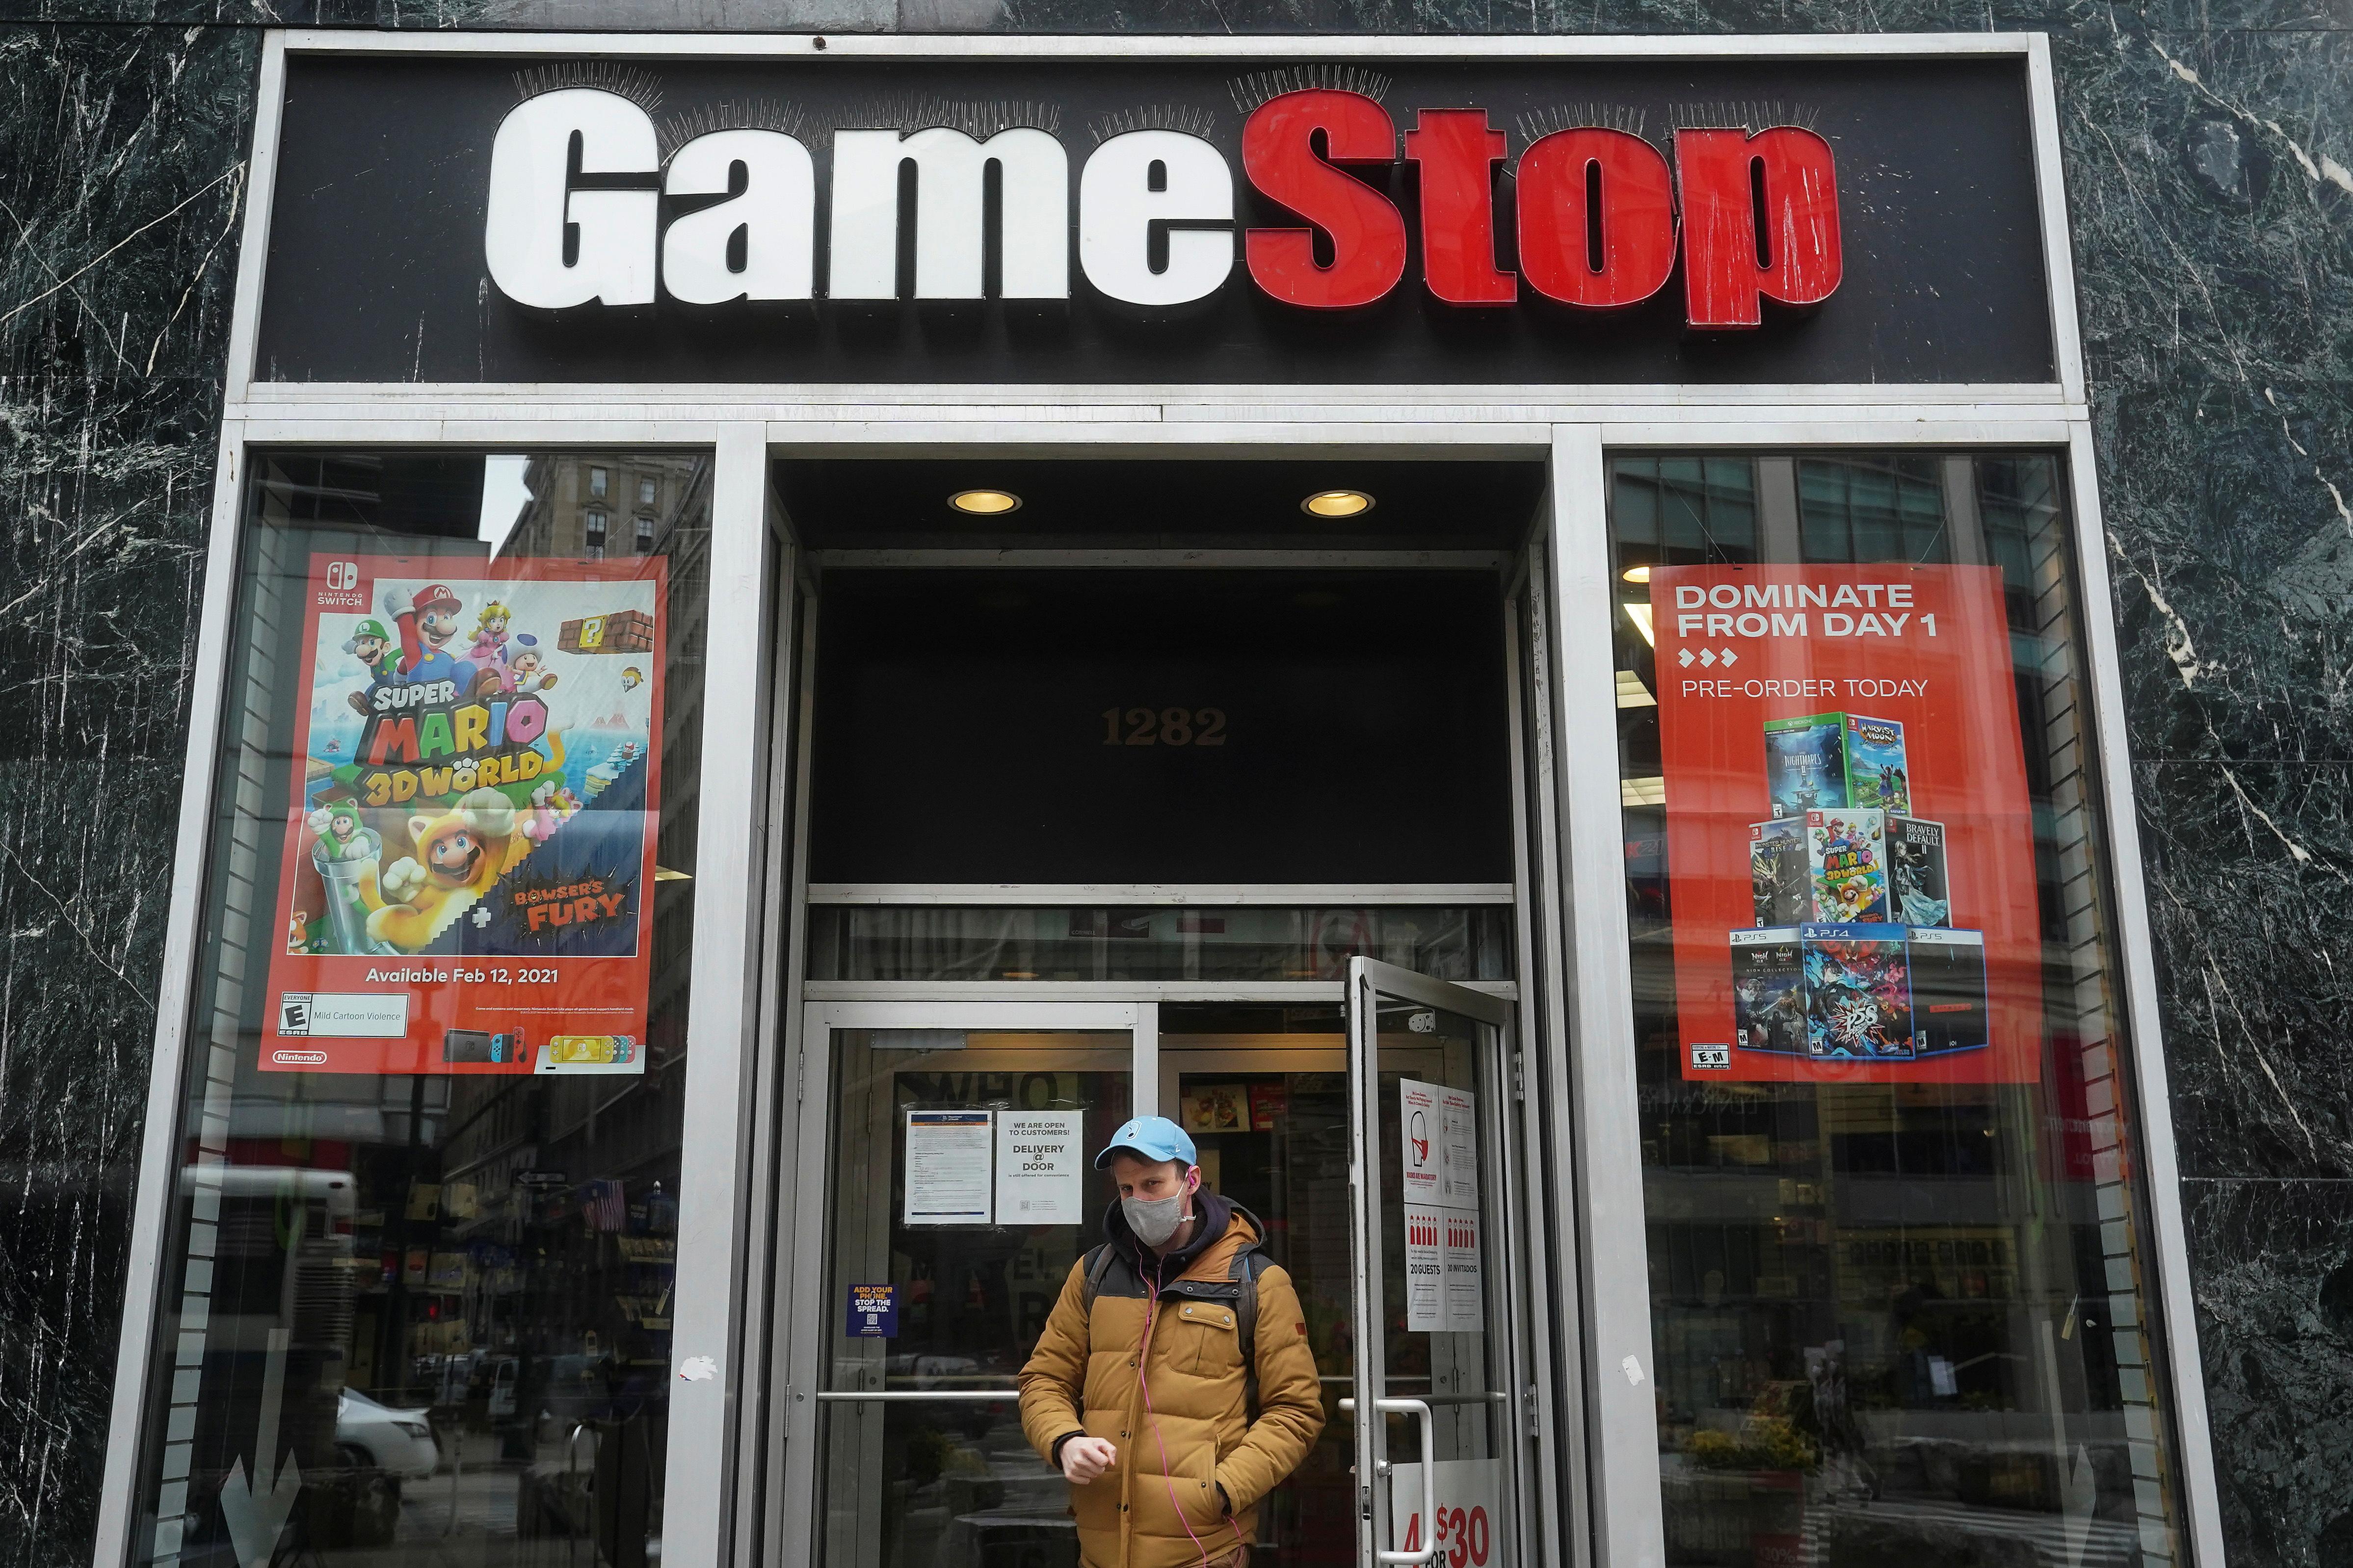 A GameStop is pictured amid the coronavirus disease (COVID-19) pandemic in the Manhattan borough of New York City, New York, U.S., January 27, 2021. REUTERS/Carlo Allegri